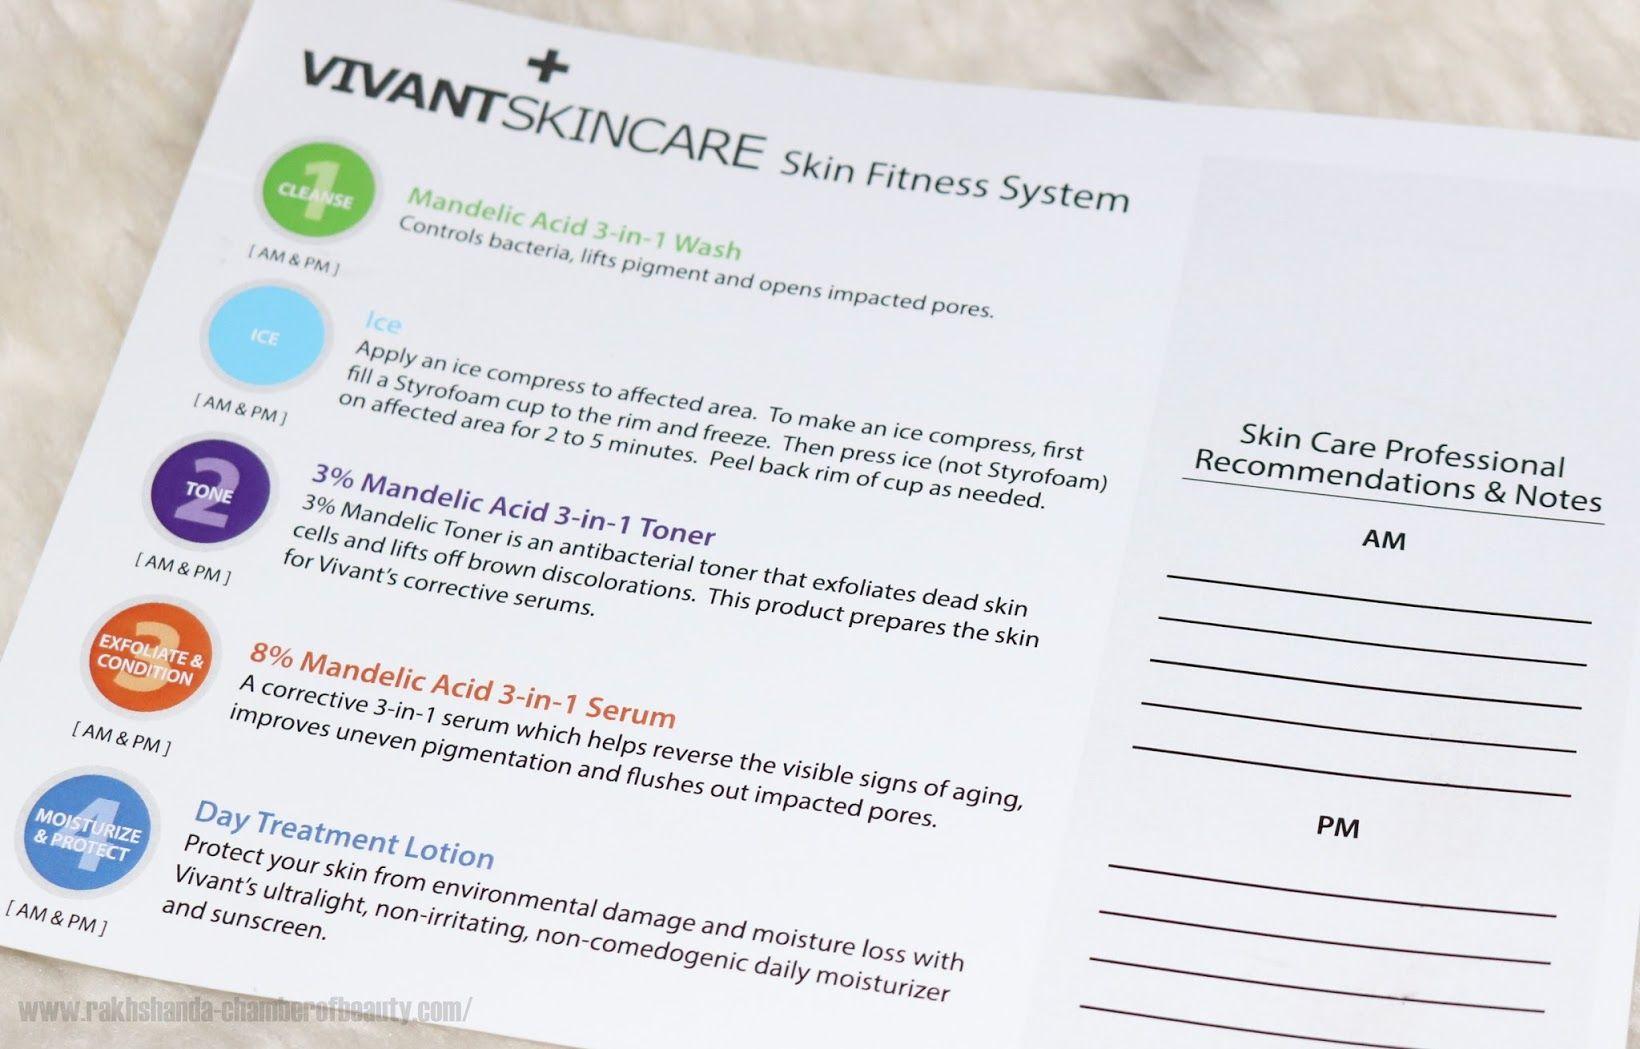 Vivant Skincare Skin Fitness System Skin care, Skin, How